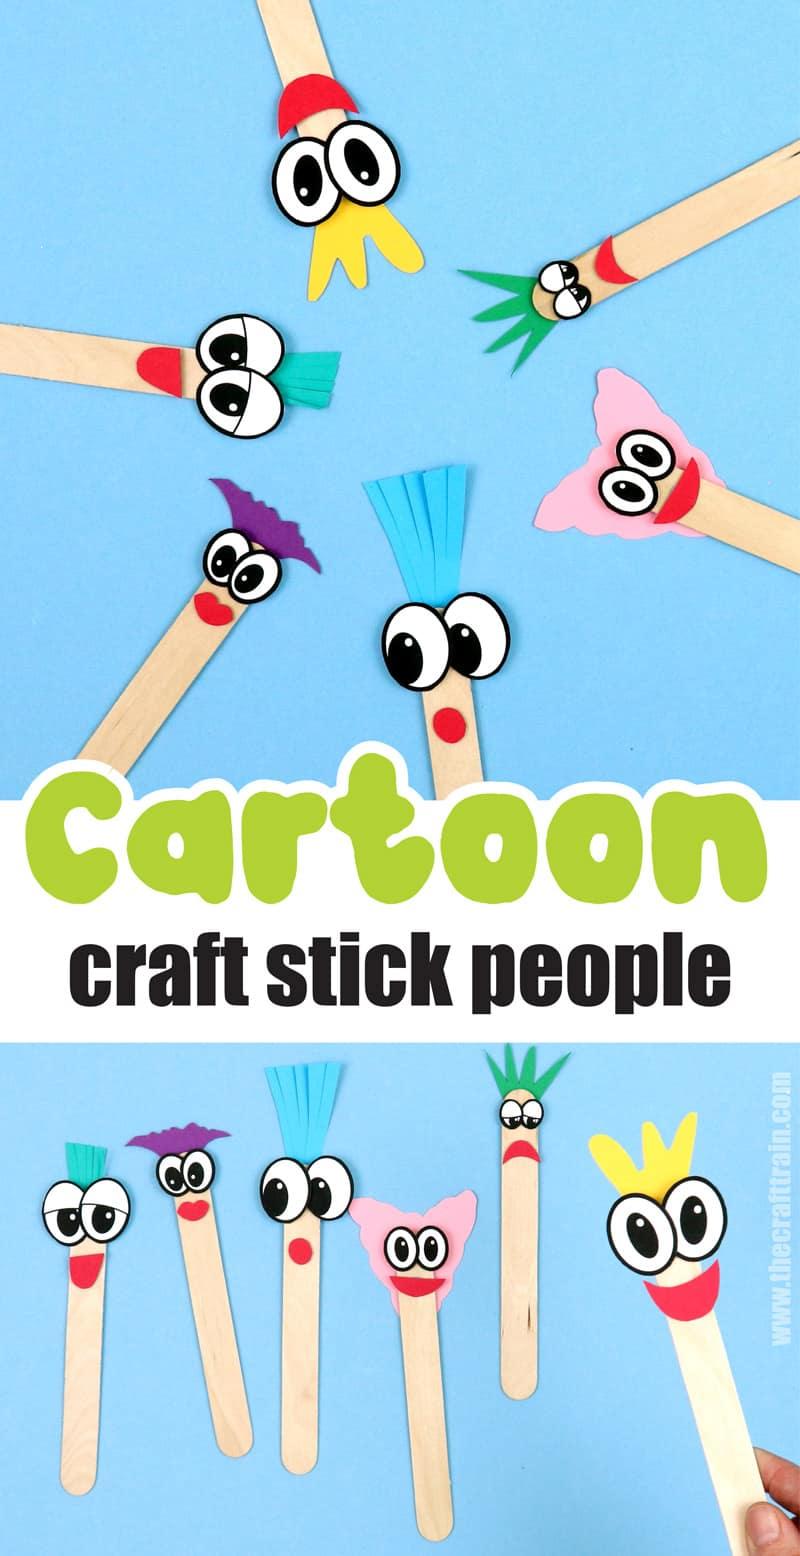 cartoon craft stick puppet cidea for kids. A fun craft stick craft idea